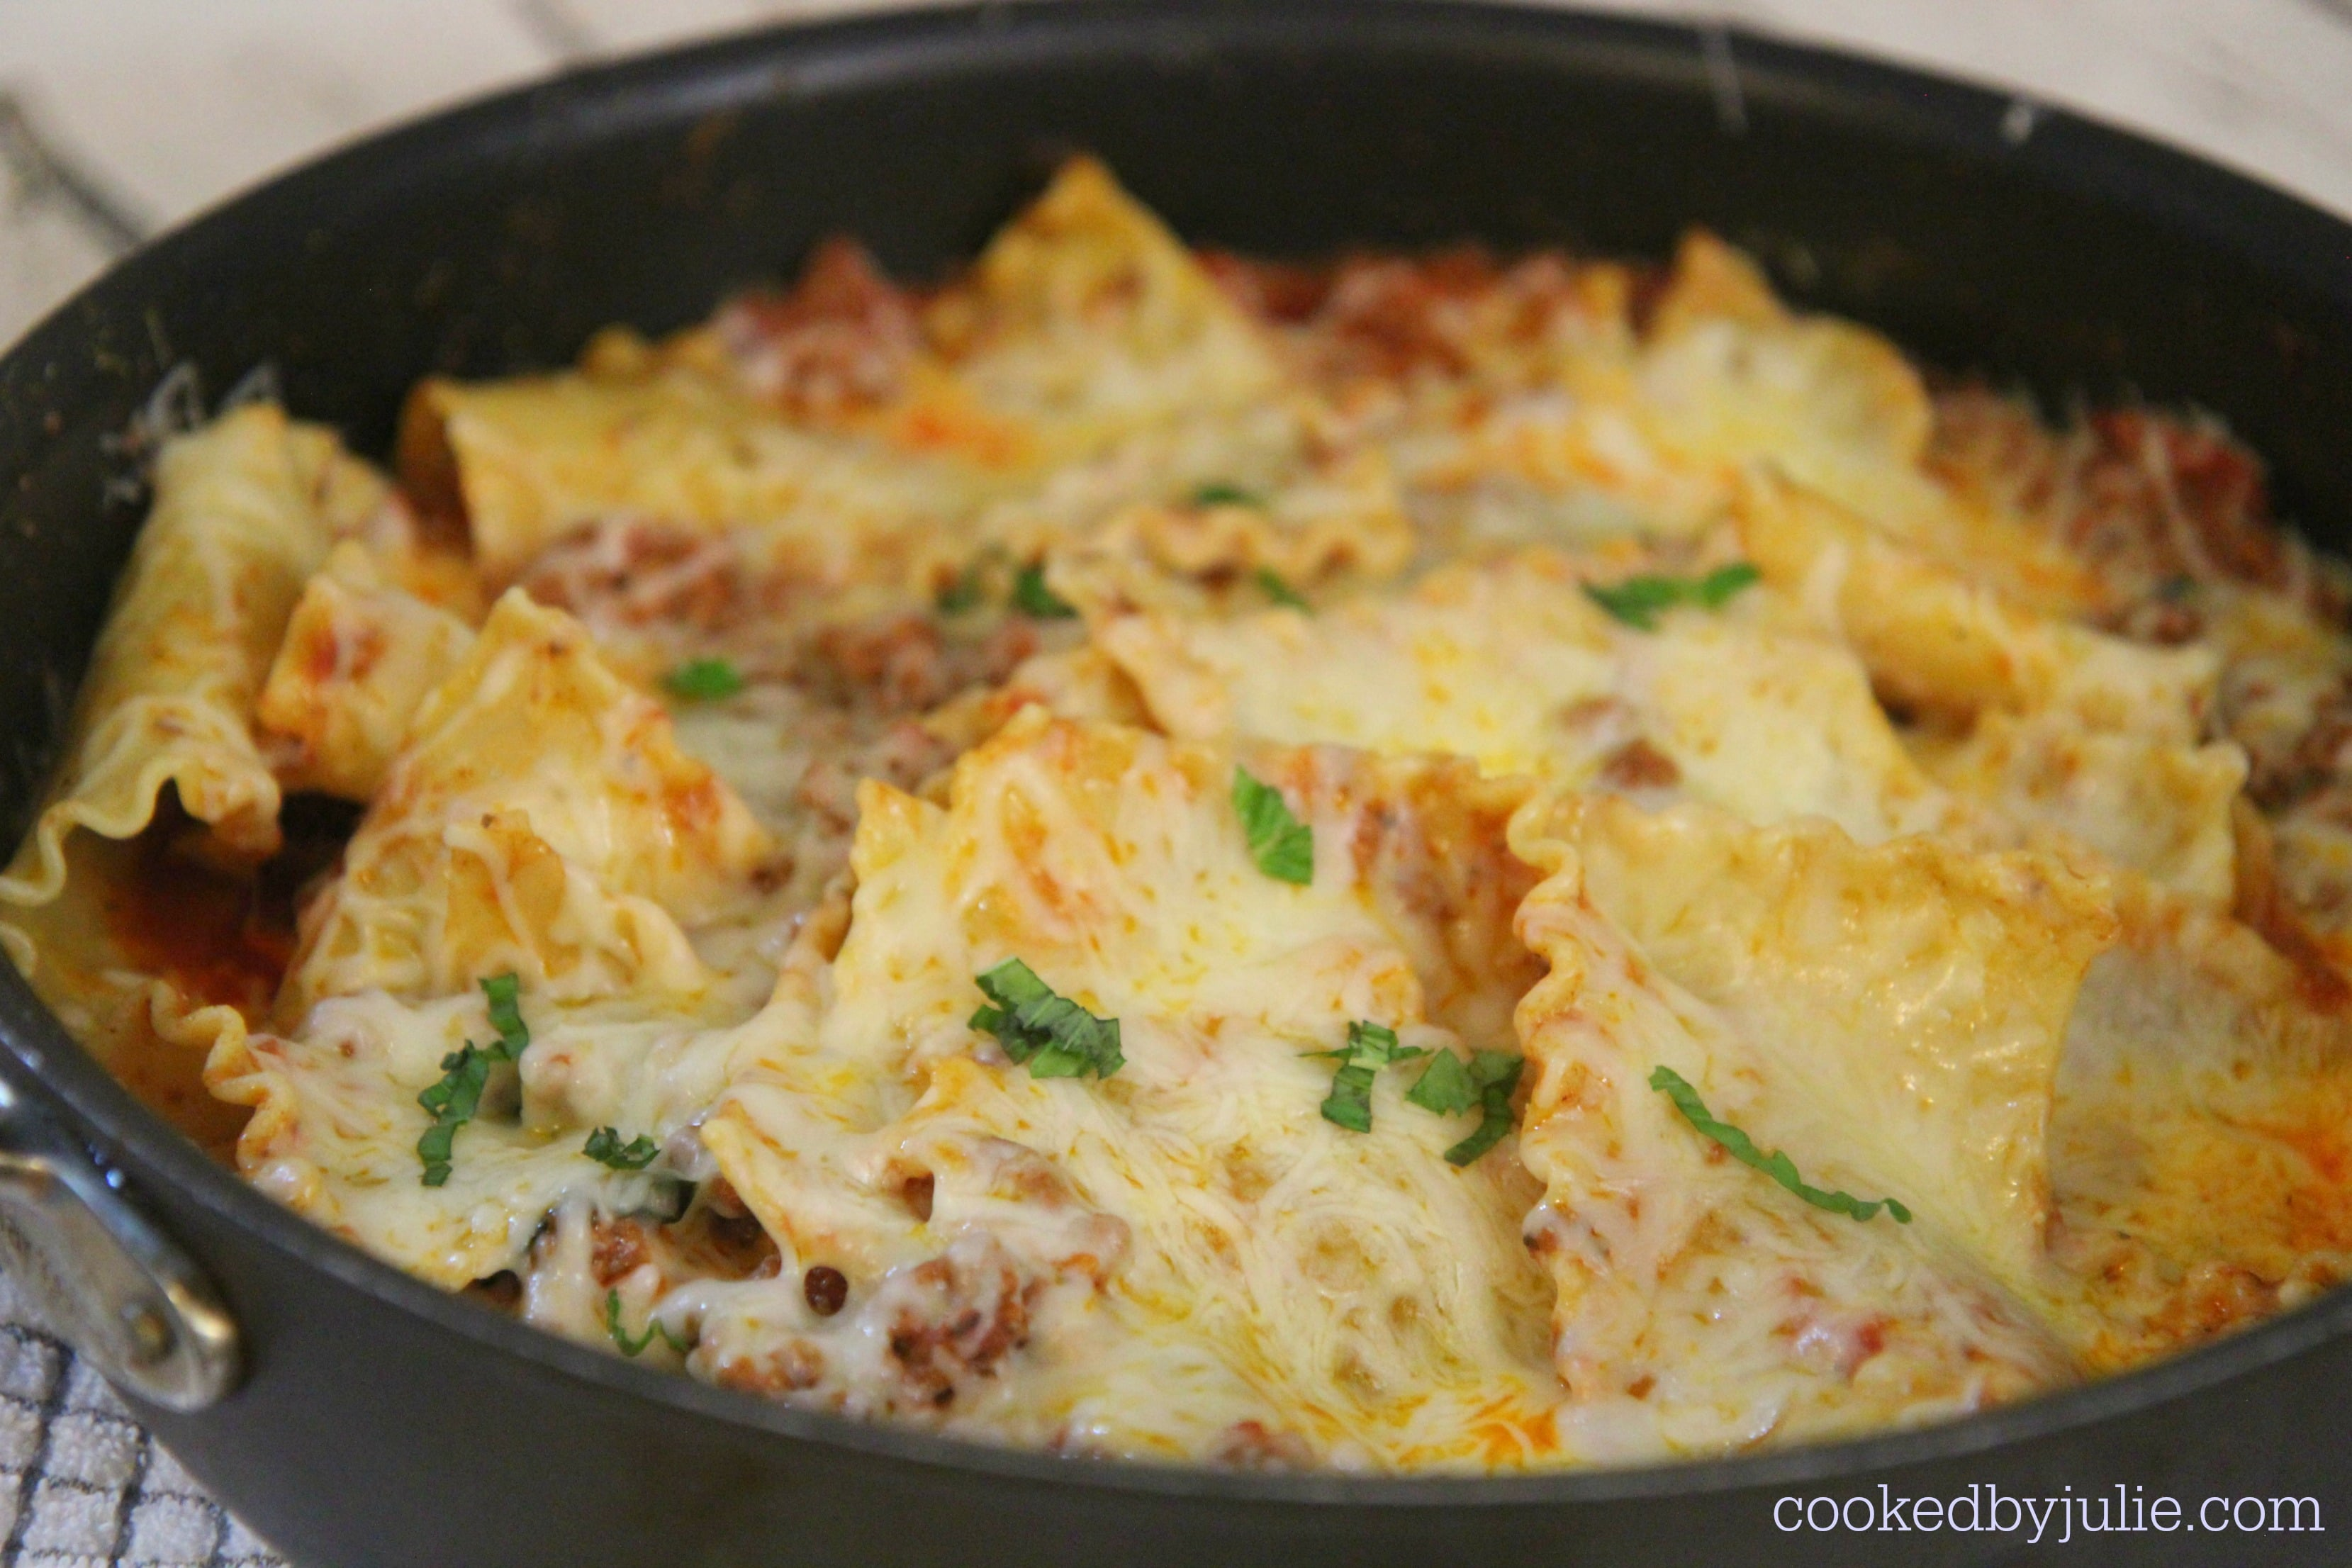 lasagna pasta, fresh basil, sauce, and cheese in a skillet.